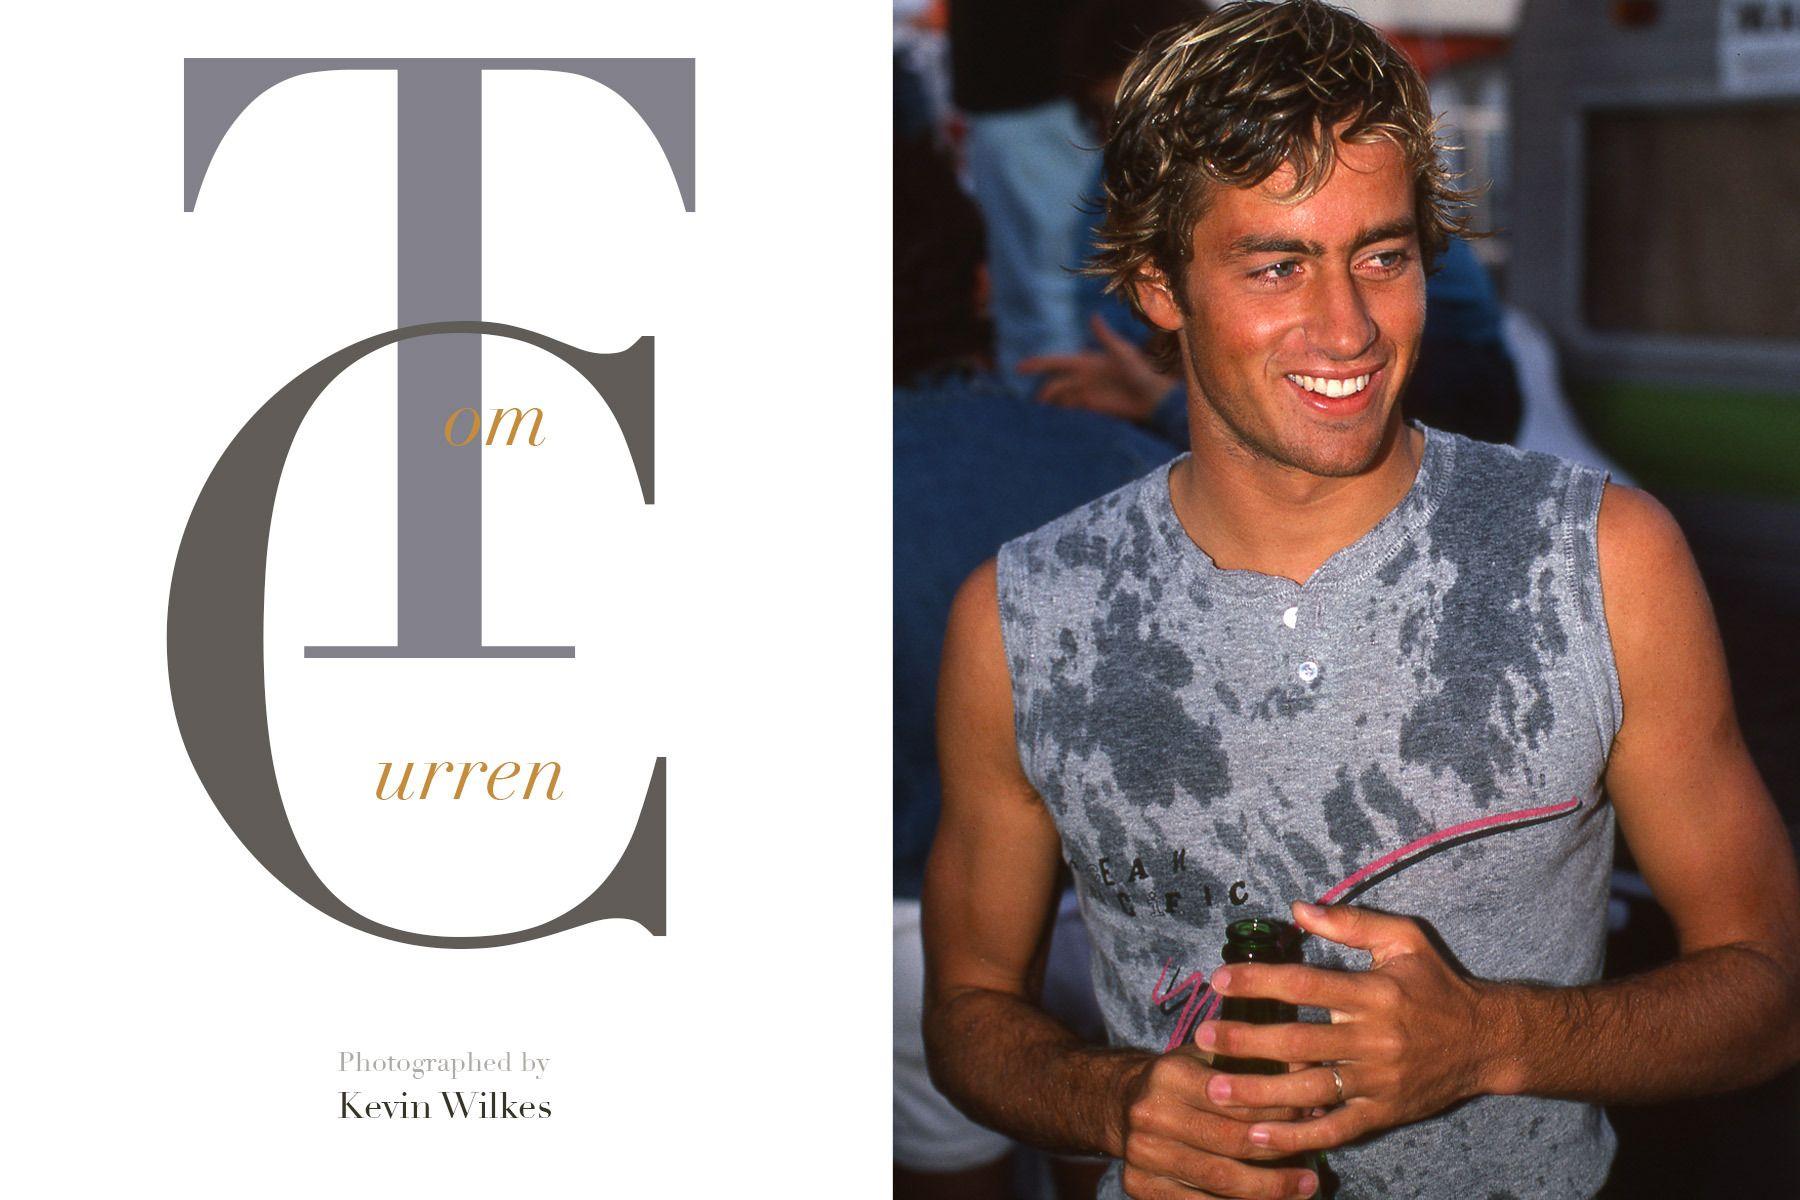 Tom Curren. Bells Beach, Australia 1985. Kevin Wilkes copyright 2018.